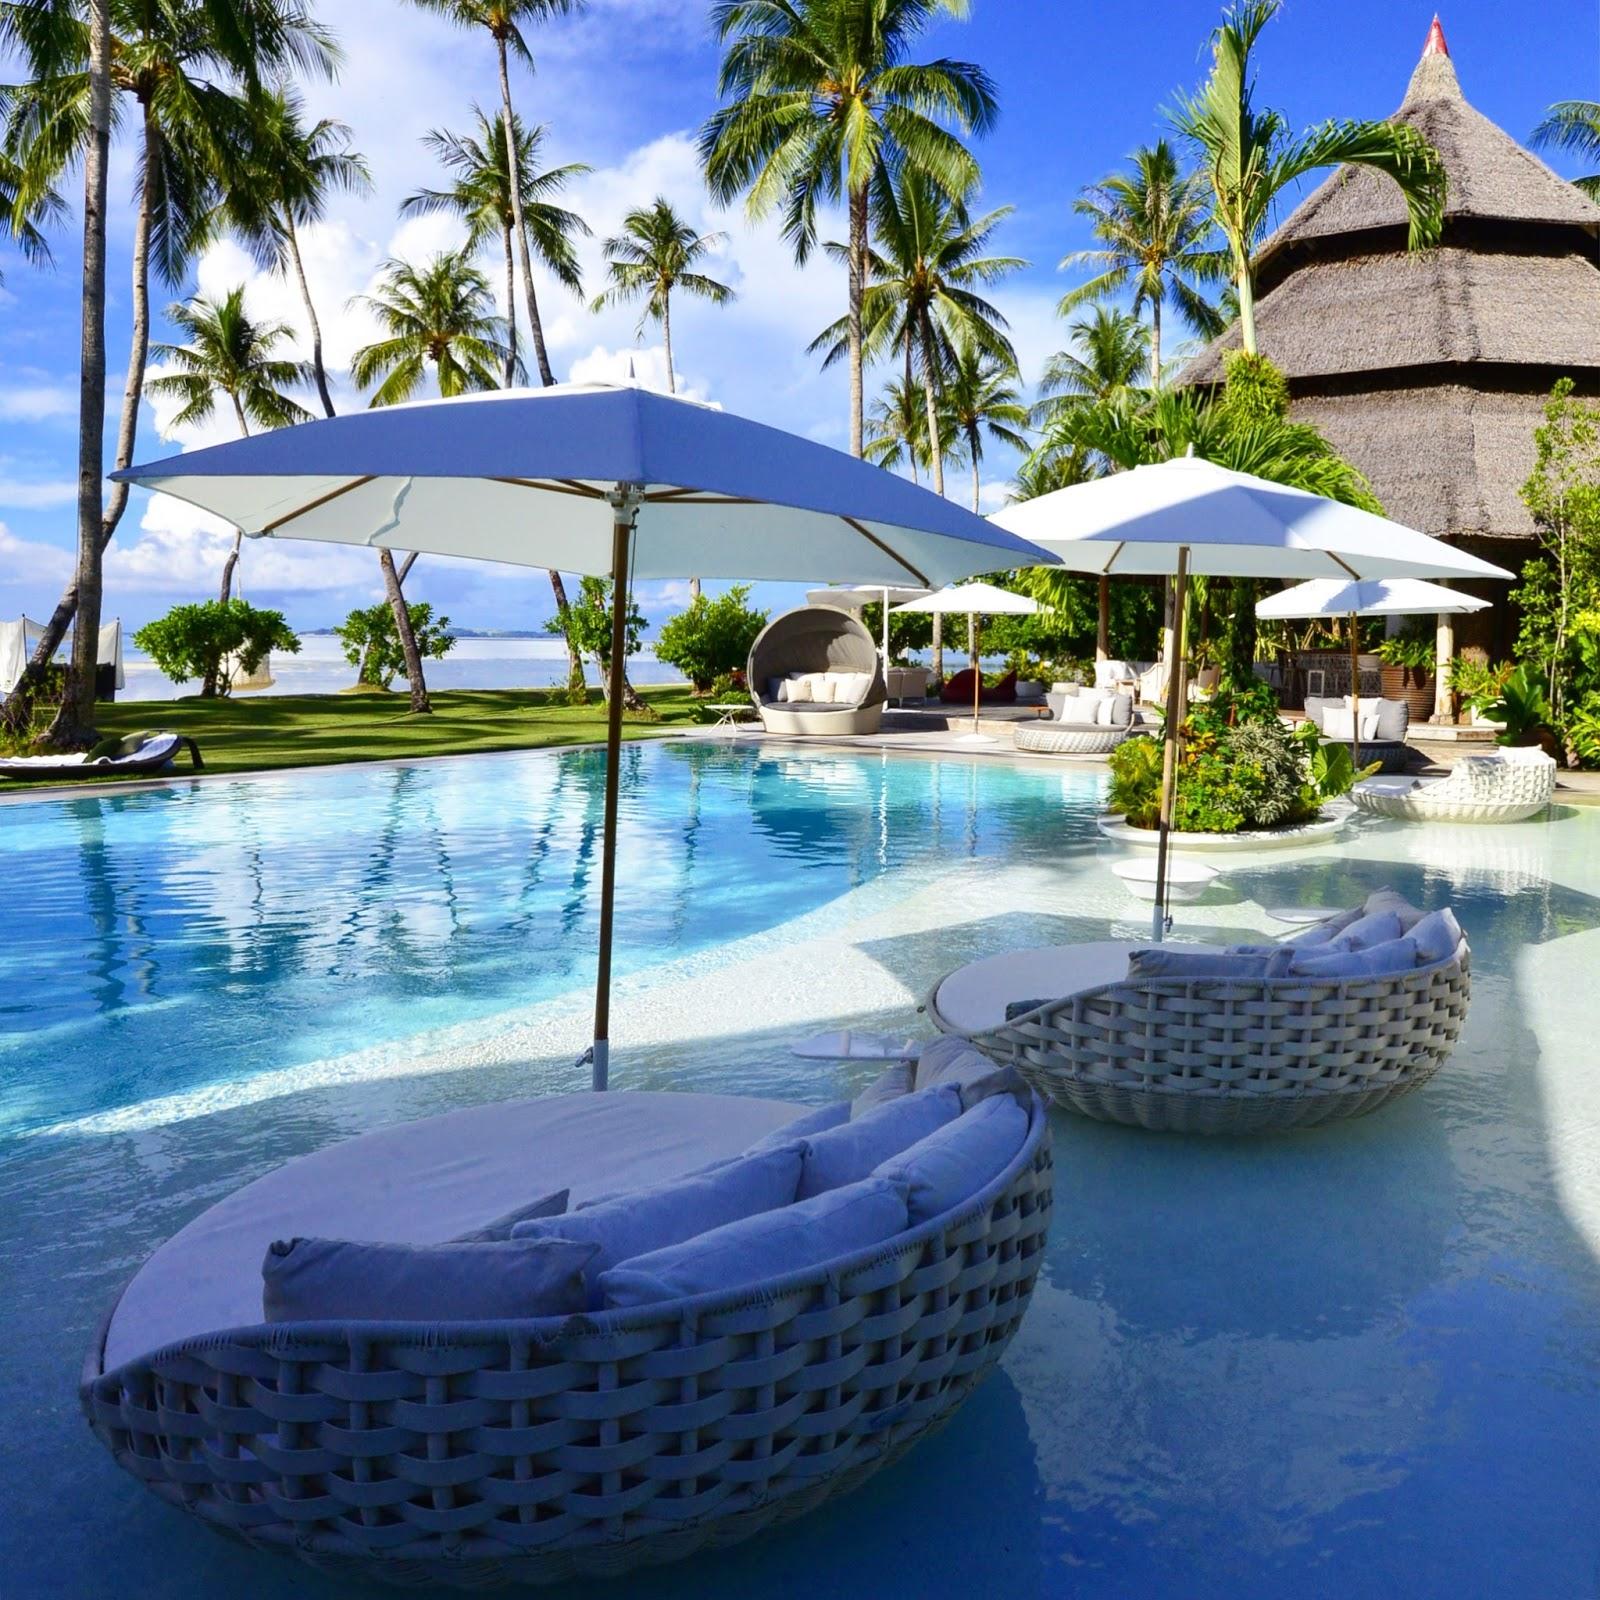 Island Resort: Grandeur Traveler: Dedon Island Resort (Now Called Nay